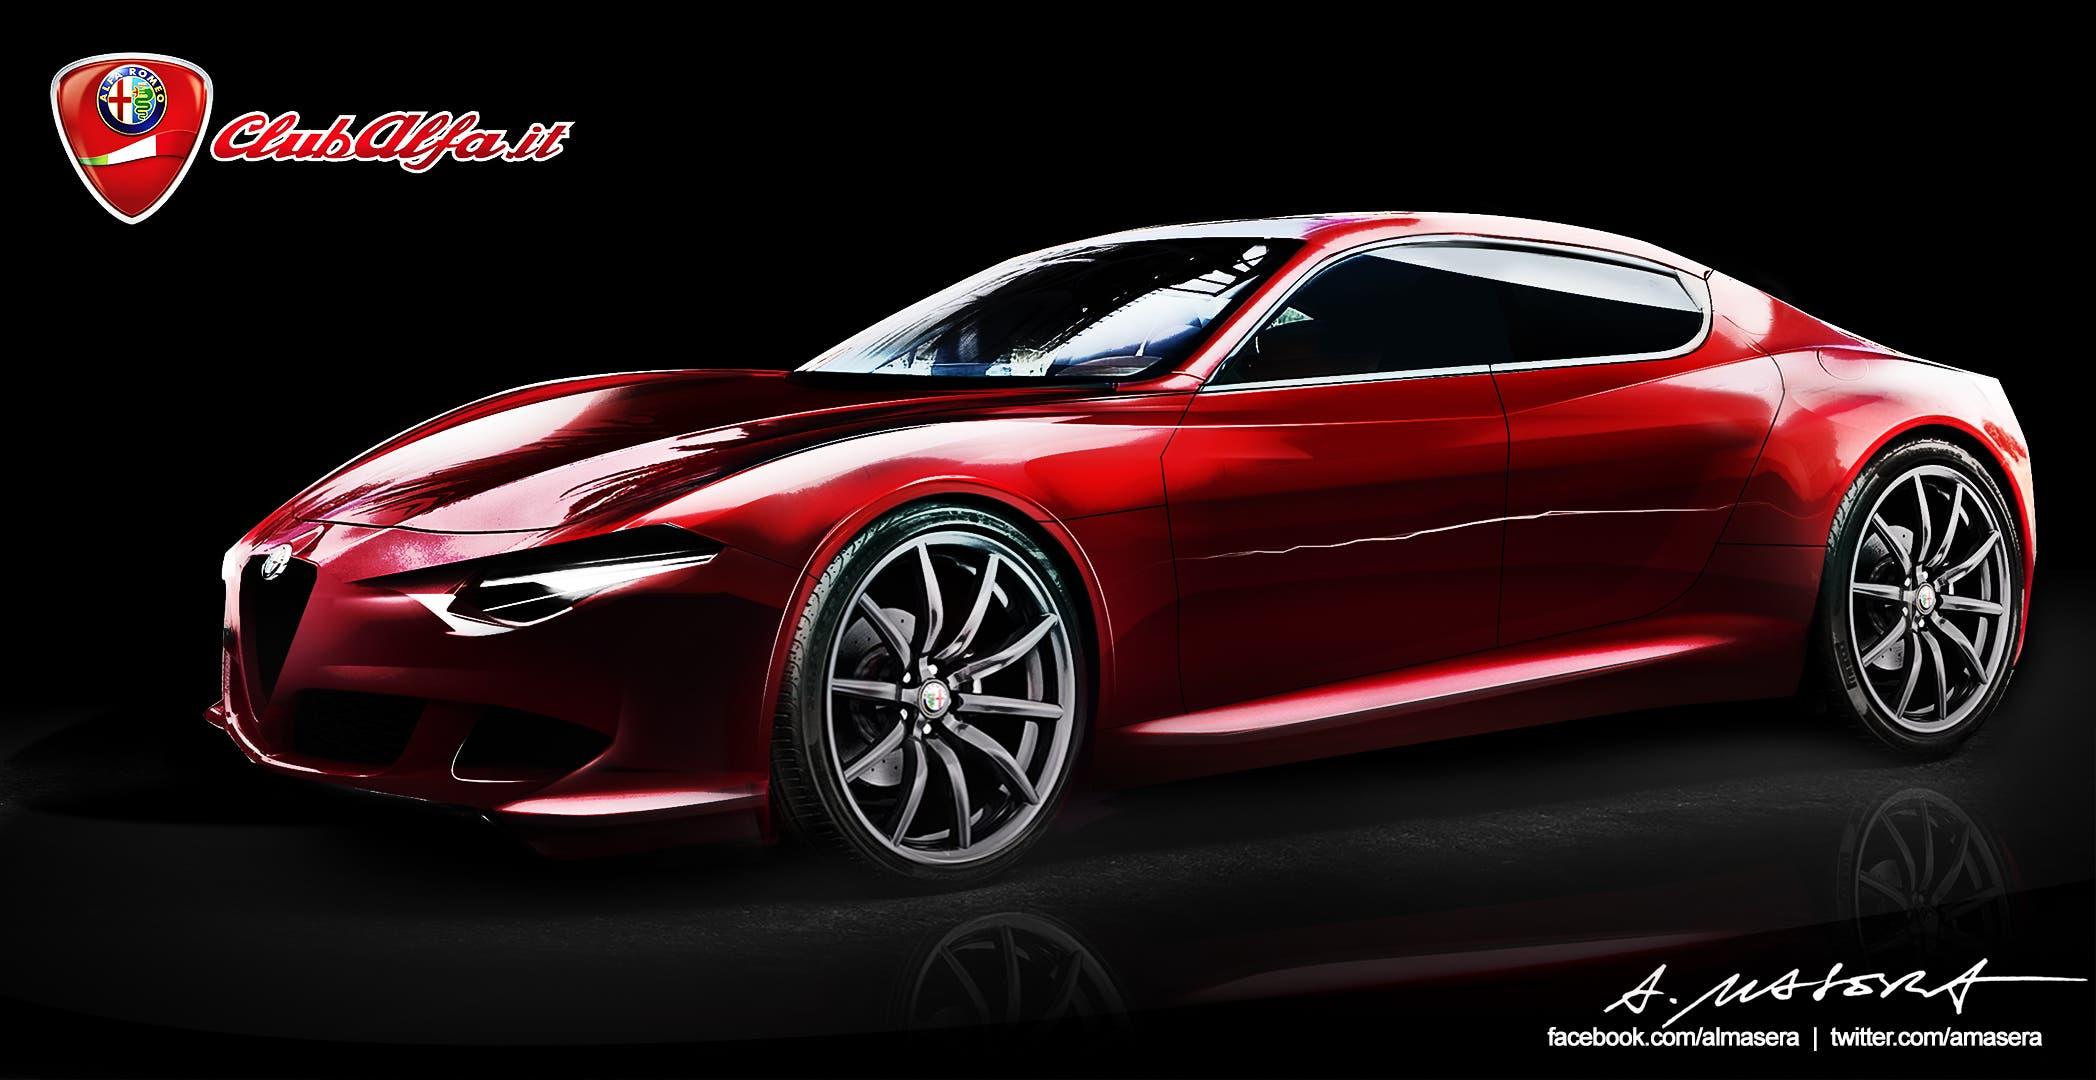 Alfa romeo giulietta 2013 models 12